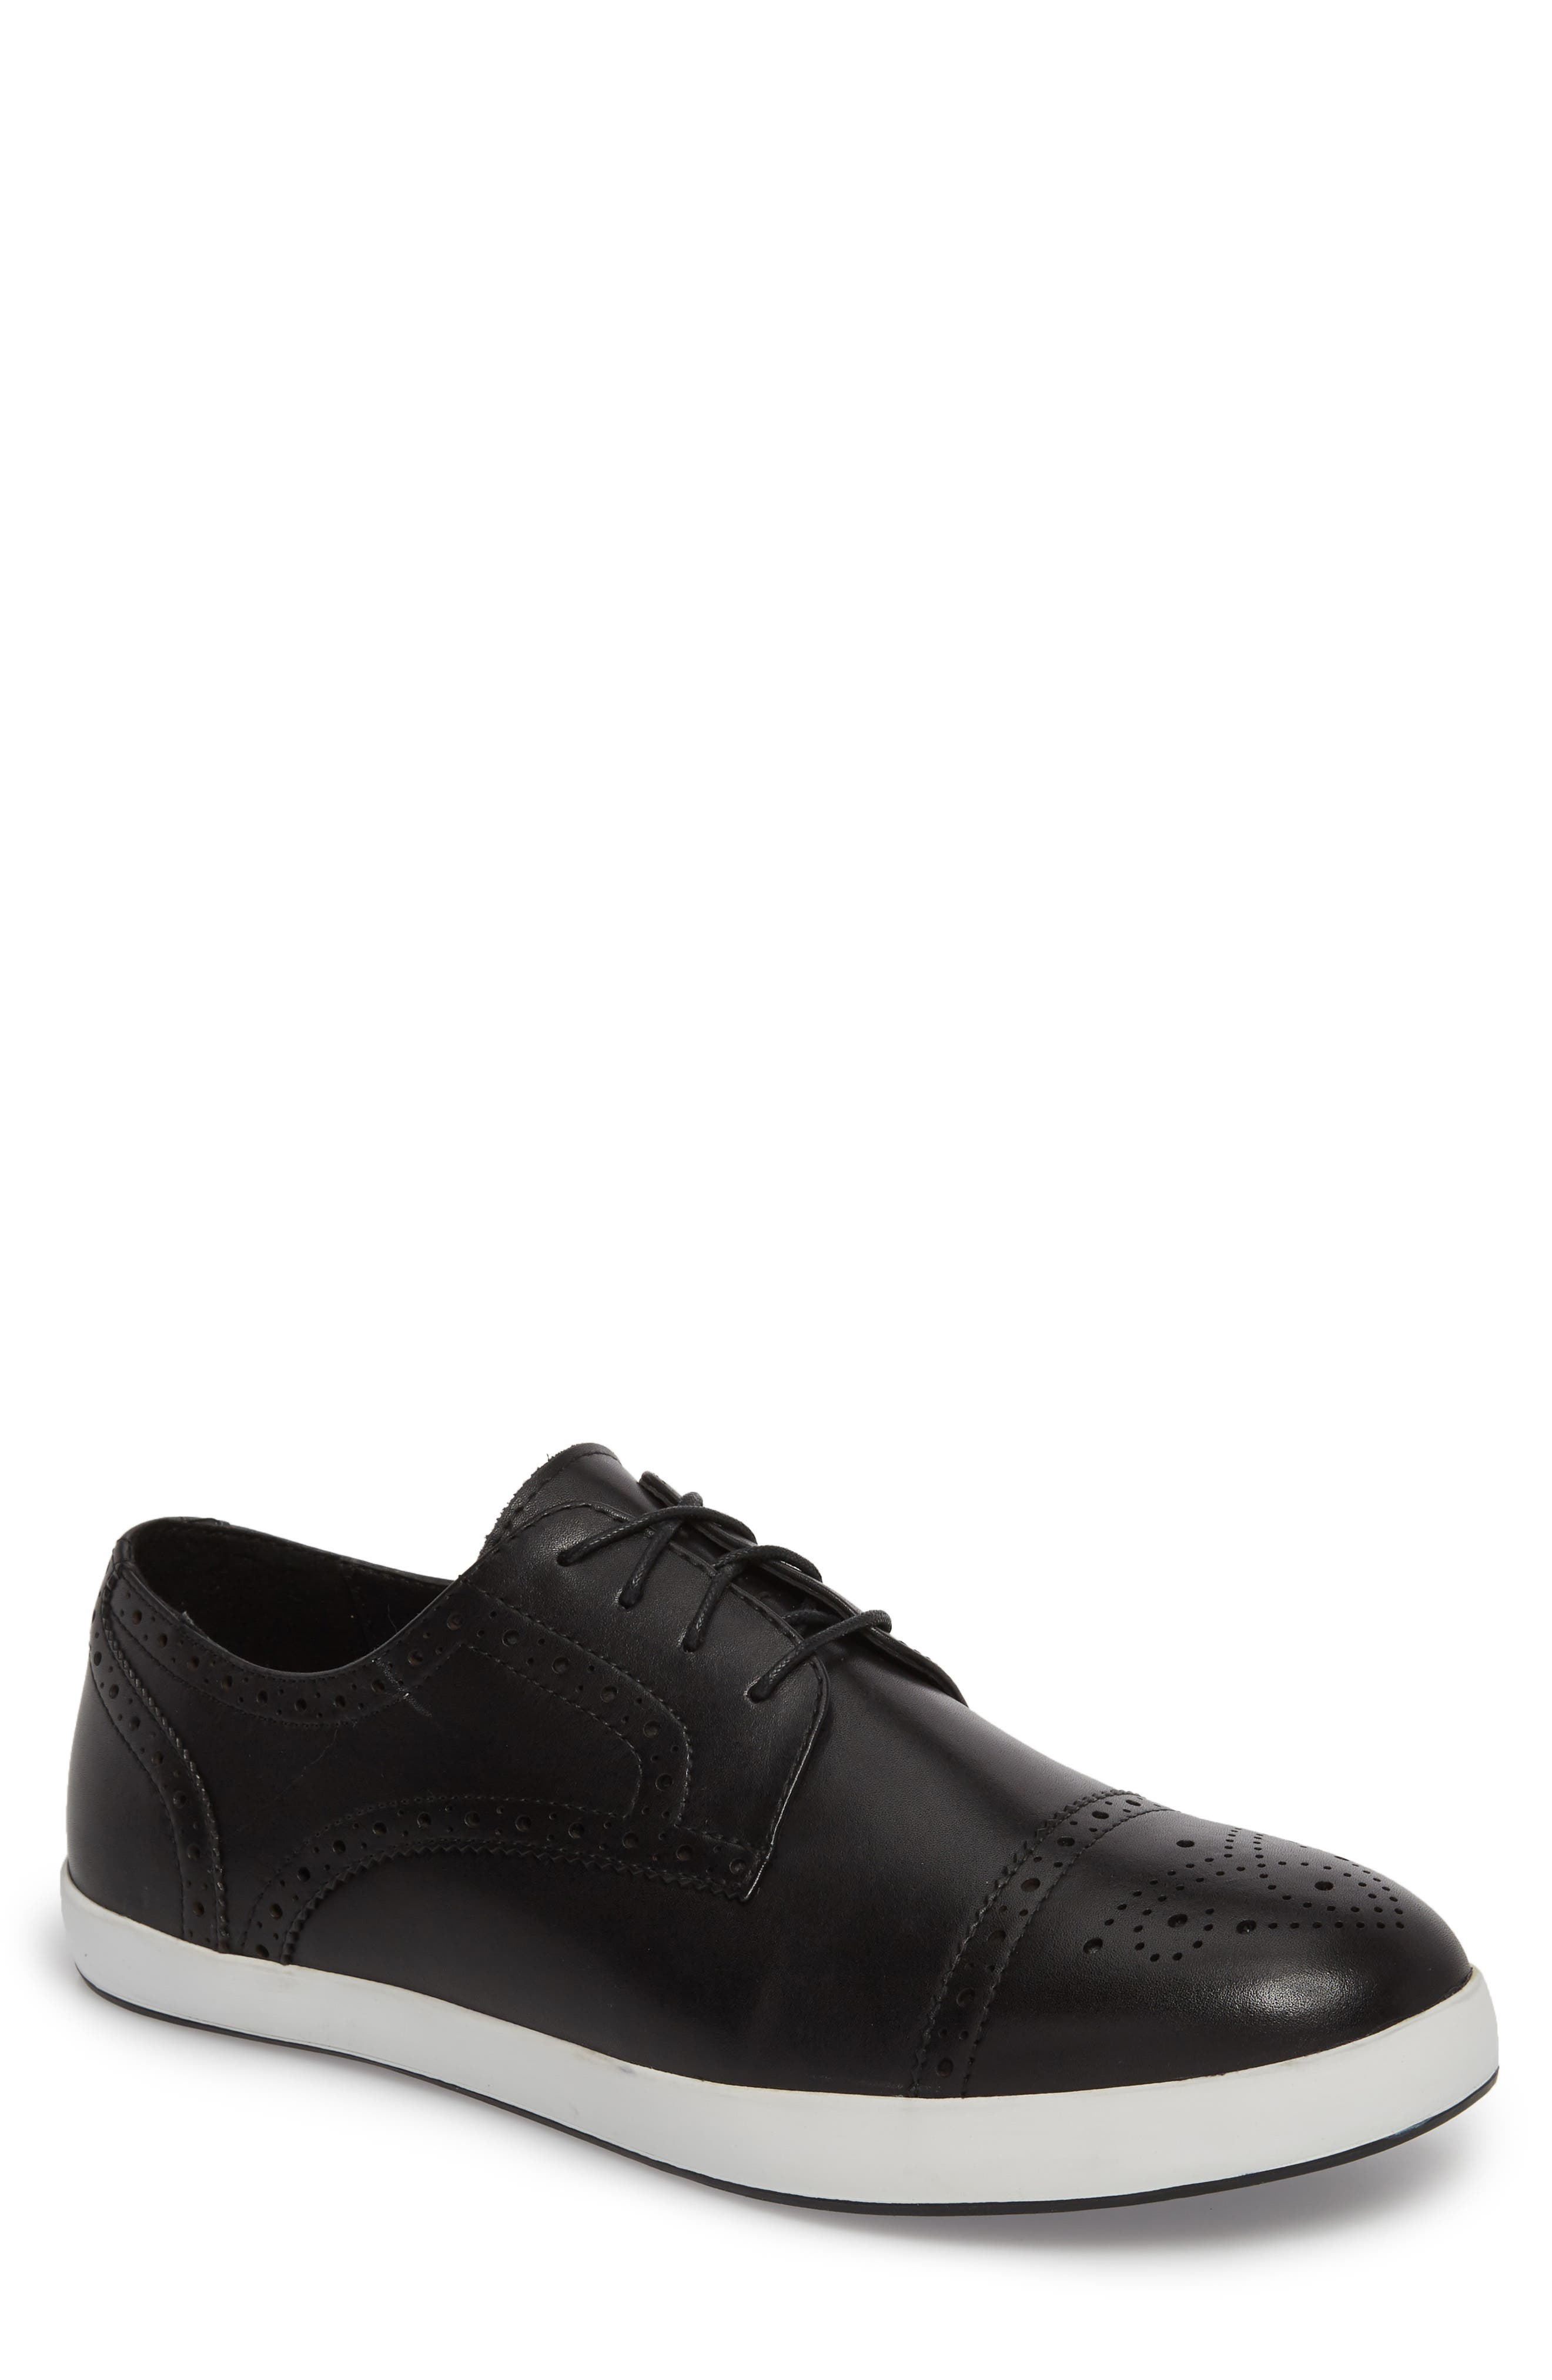 Dunnet Cap Toe Sneaker,                             Main thumbnail 1, color,                             001